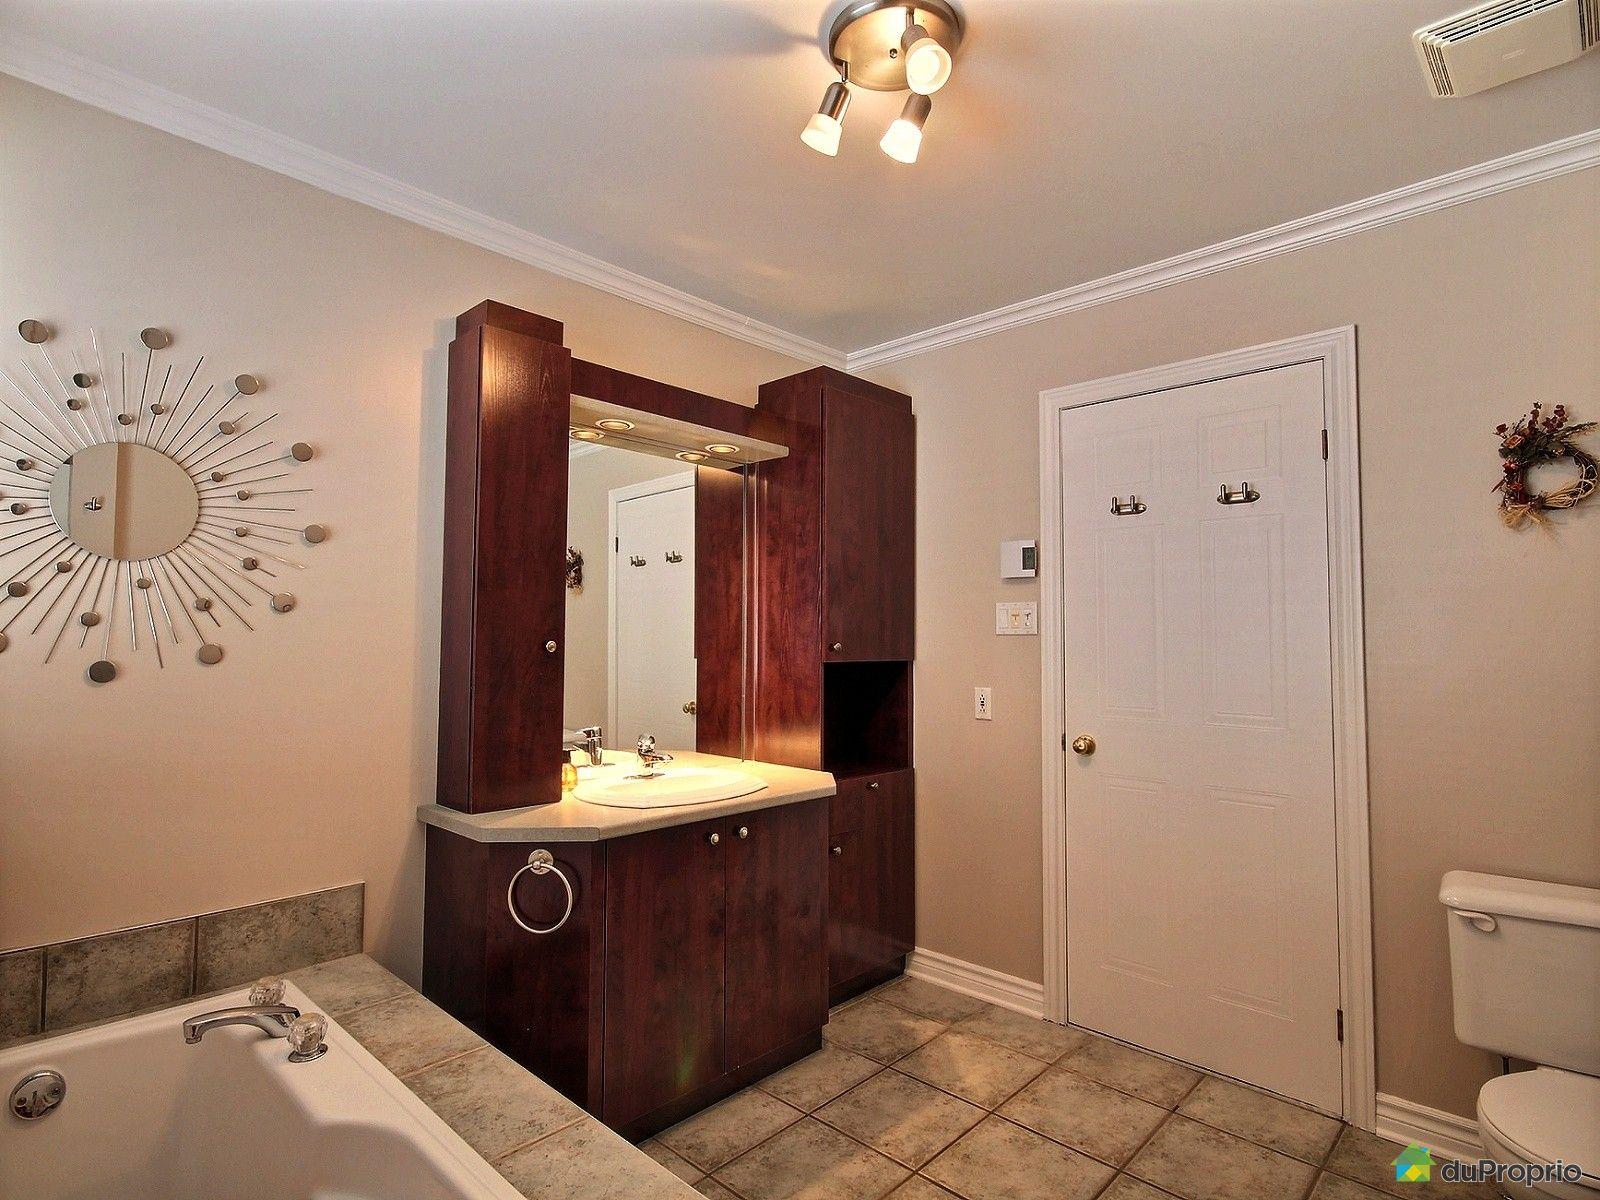 Maison vendre st eustache 548 rue des balsamines for Salle de bain 25 st eustache